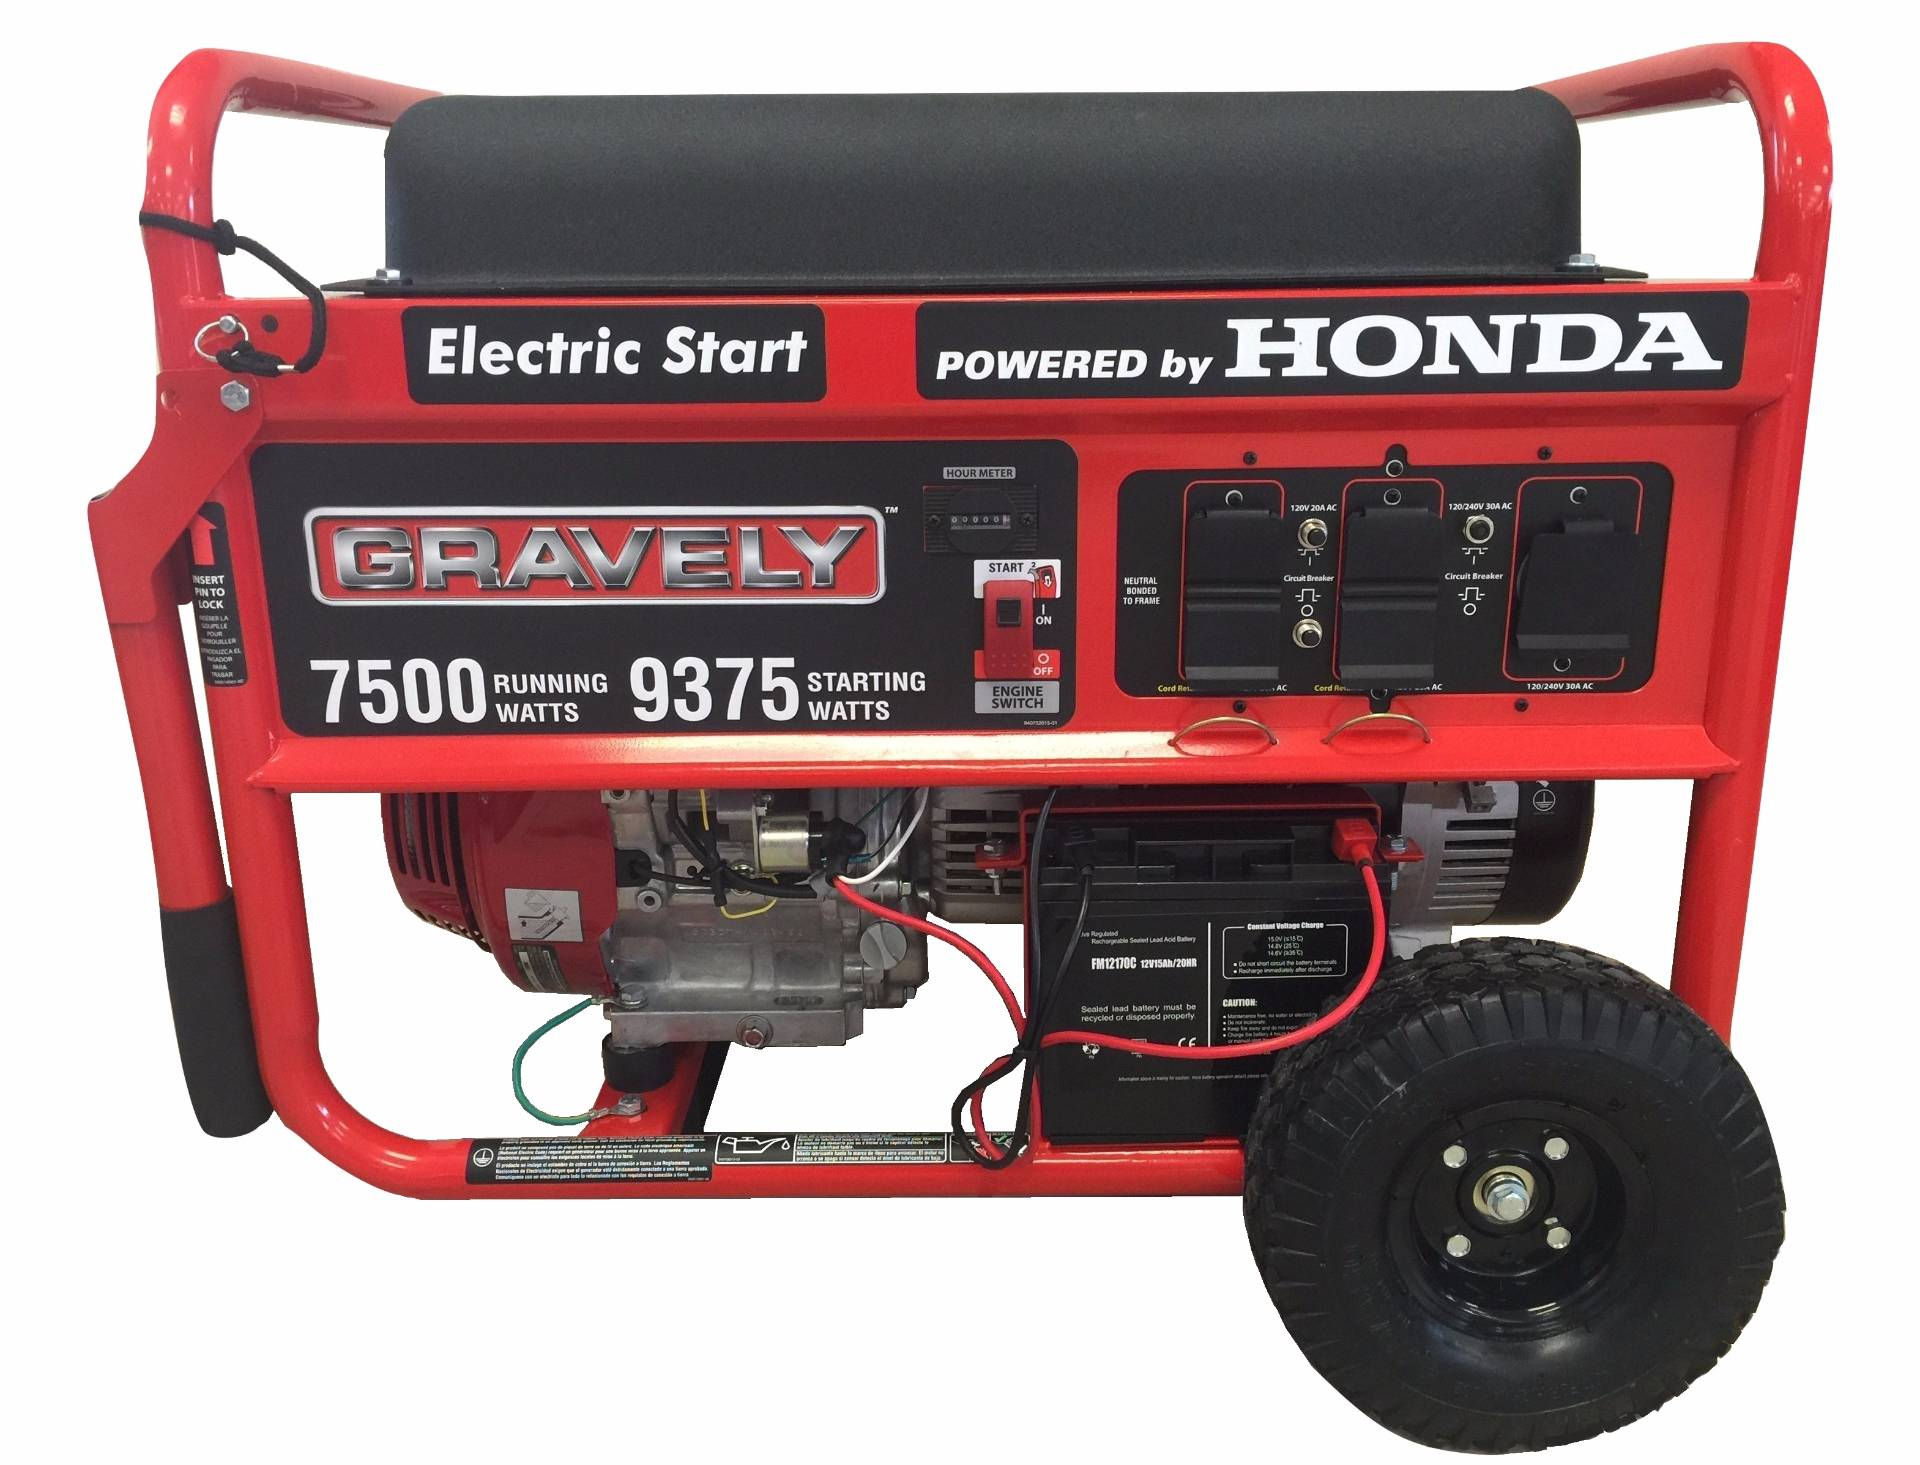 2016 Gravely 7500 Watt Generator for sale in Peabody MA